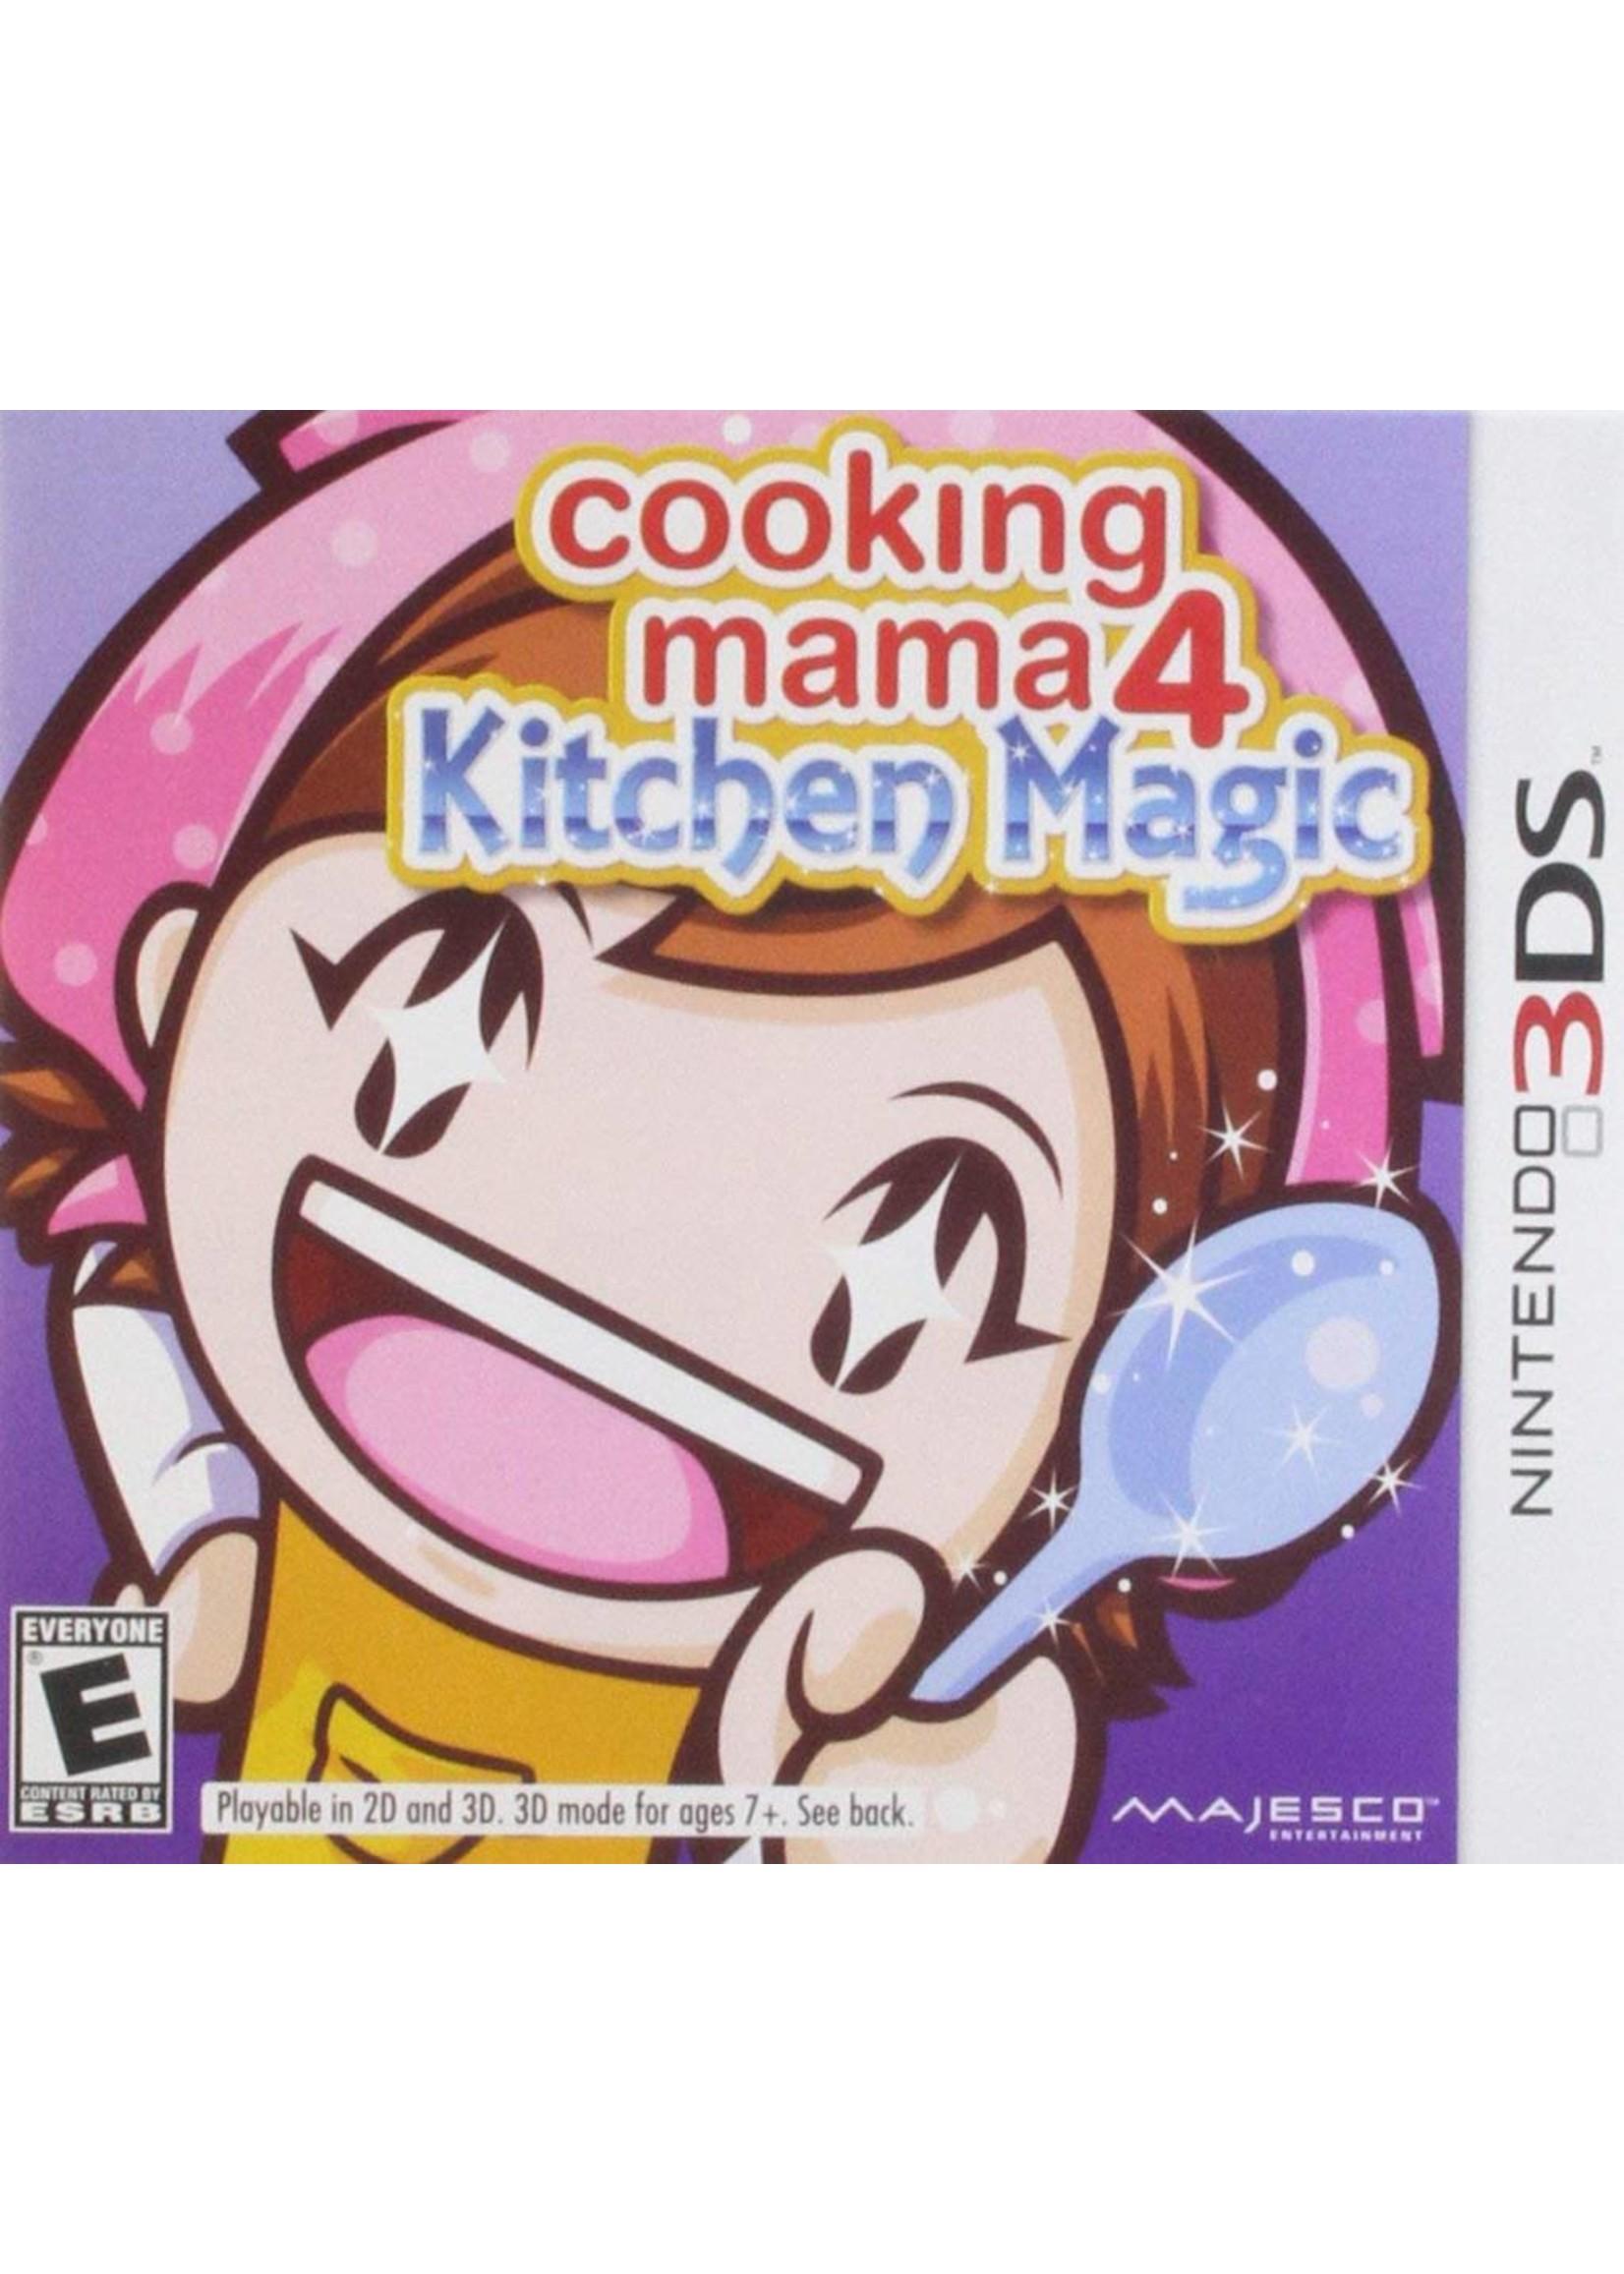 Cooking Mama 4: Kitchen Magic - 3DS PrePlayed